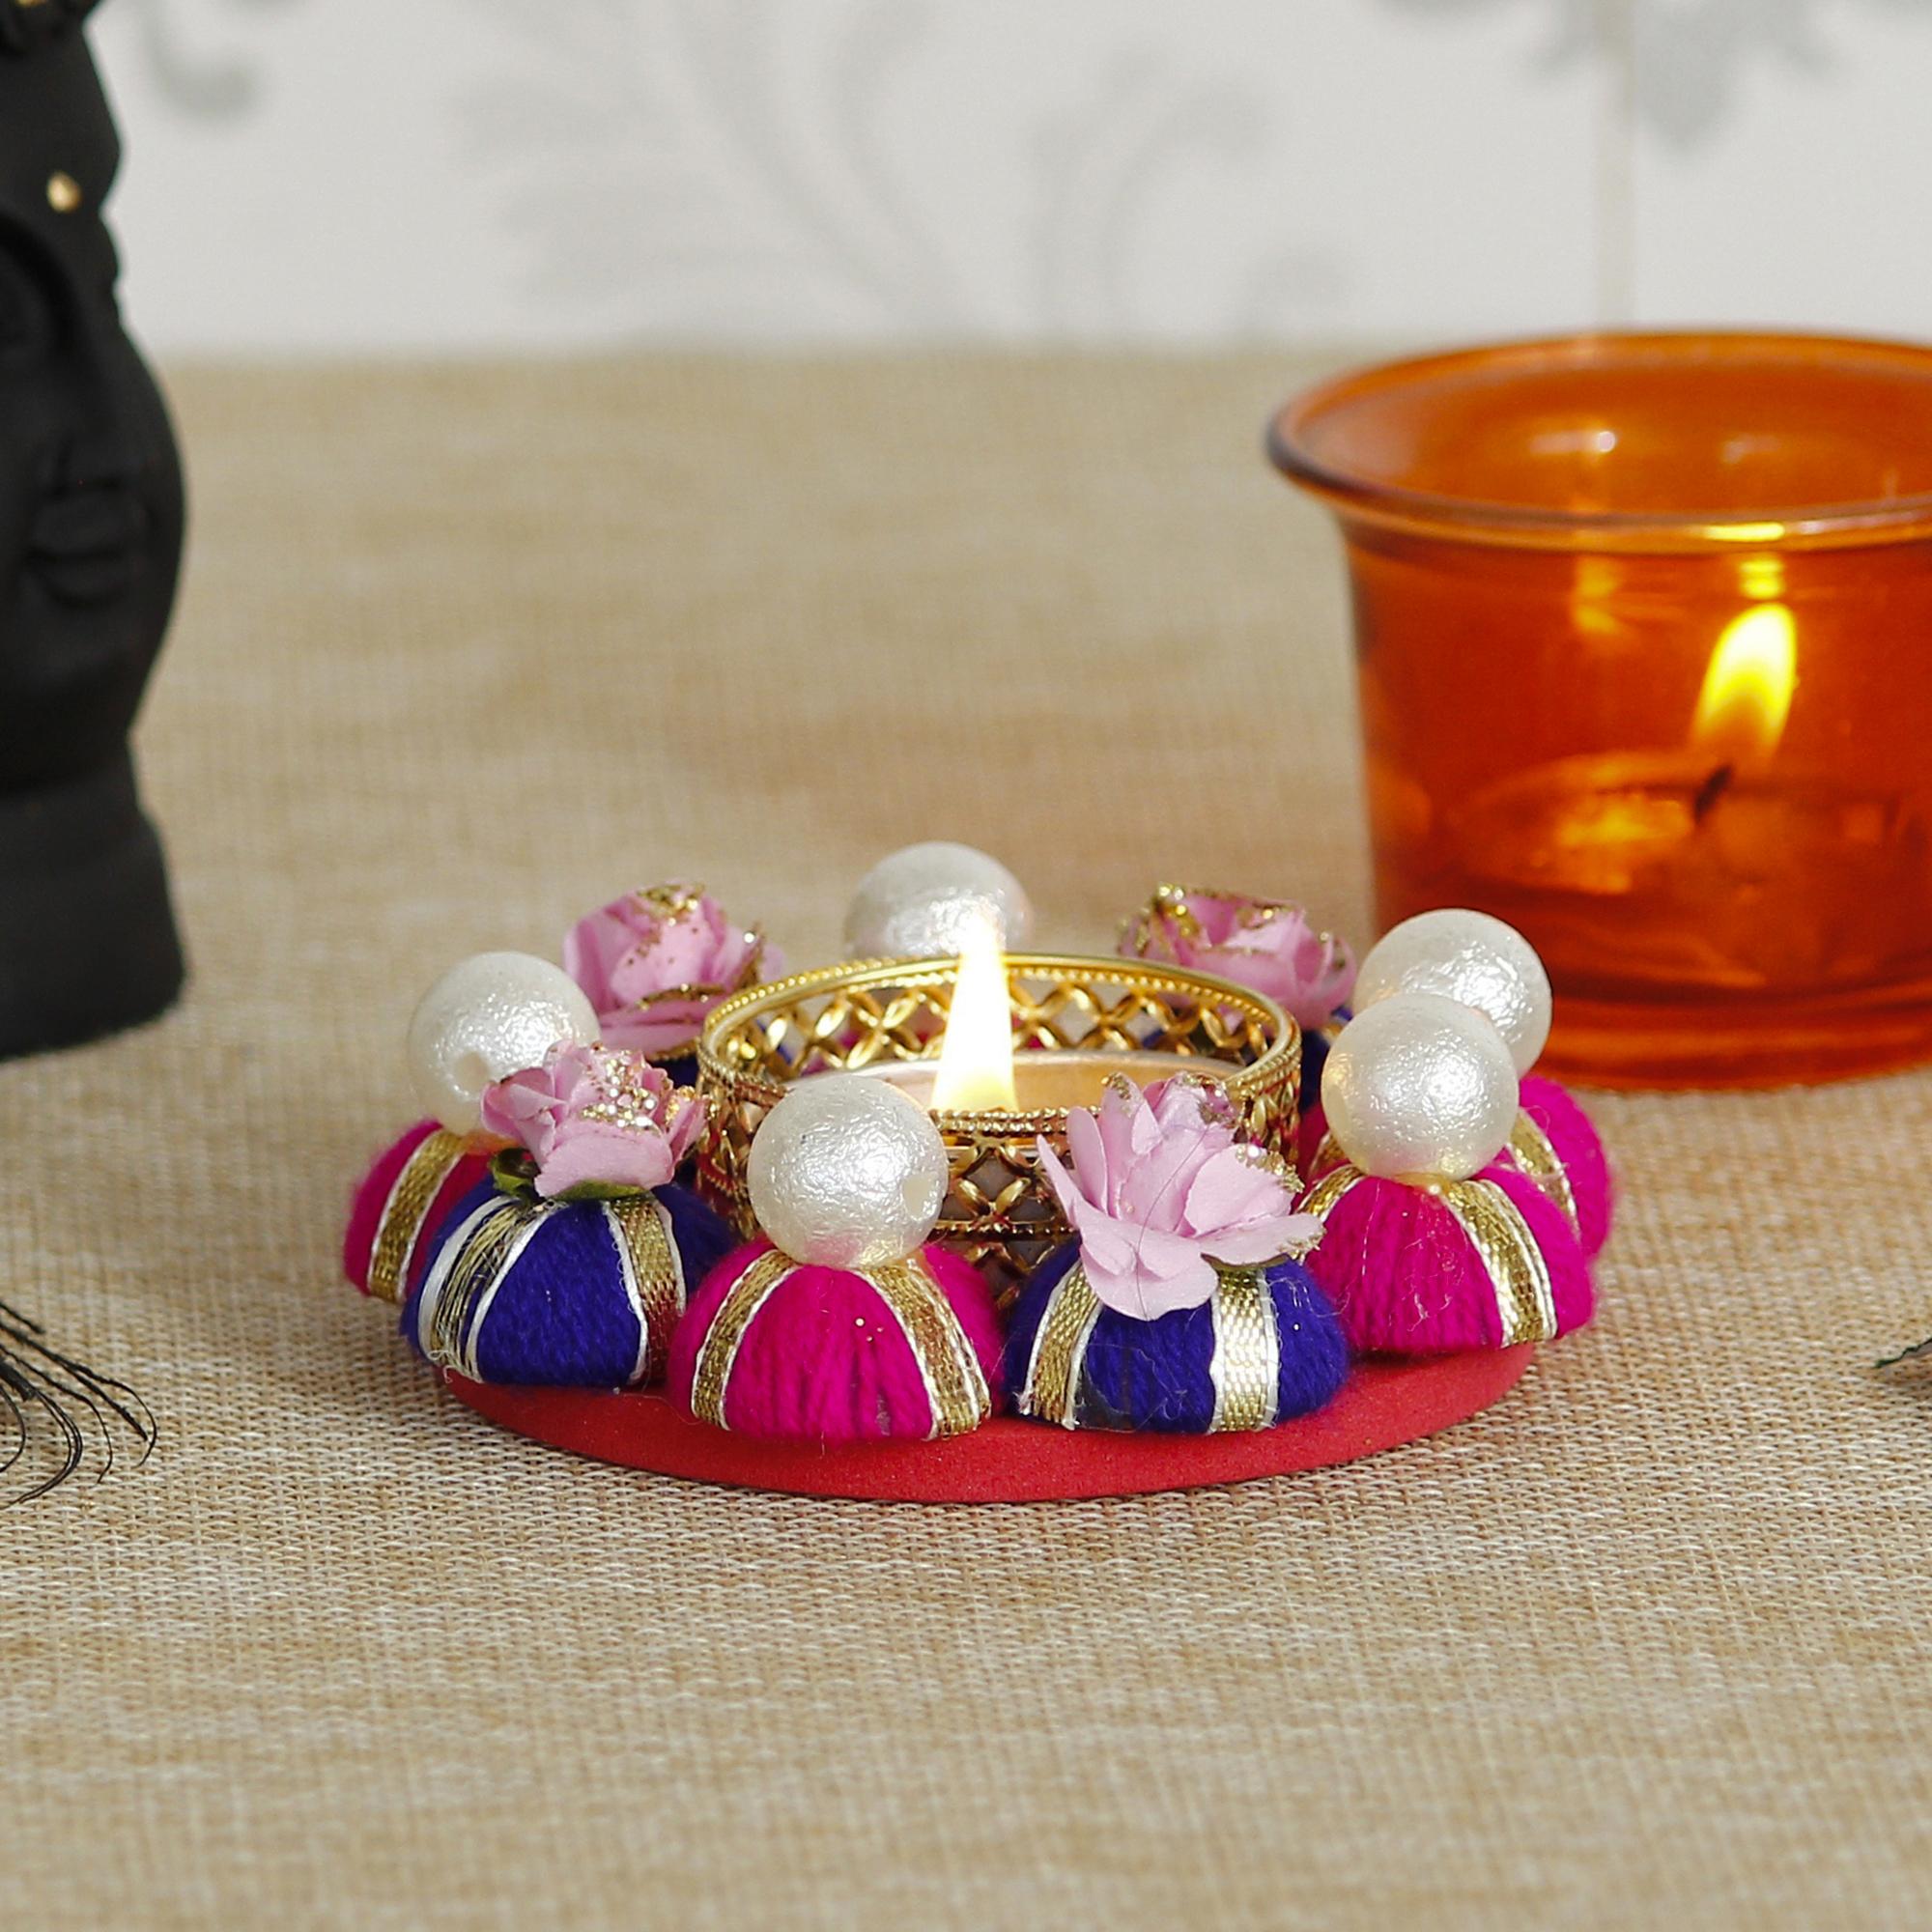 Decorative Handcrafted Gota Patti Work Tea Light Holder Indian Home Decor